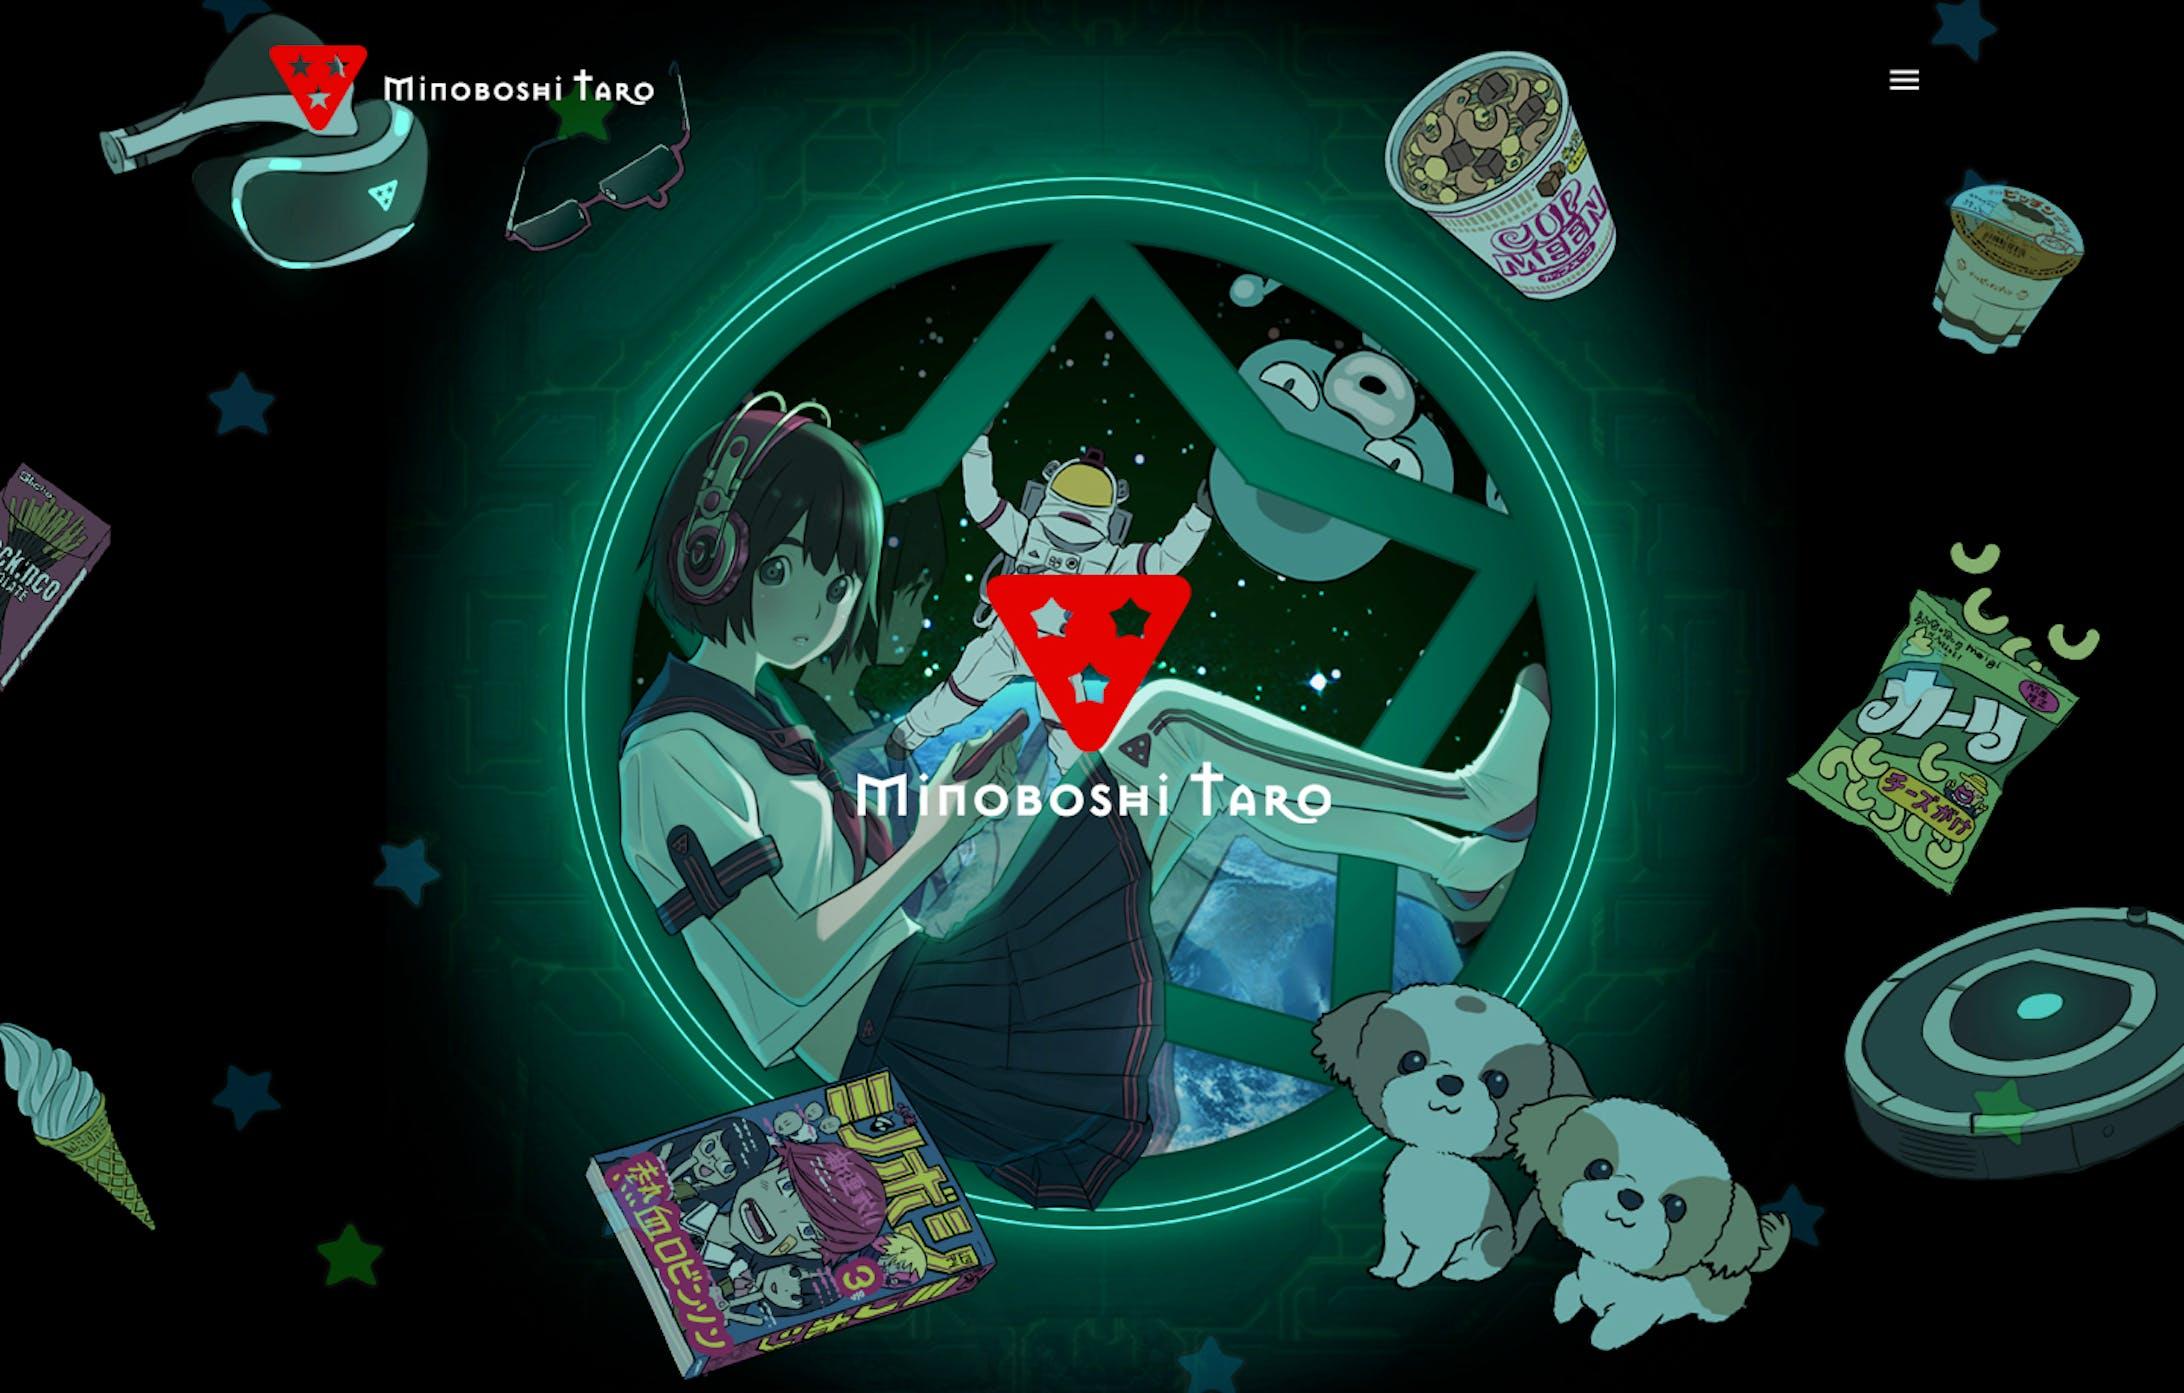 Minoboshi Taro's official website-1